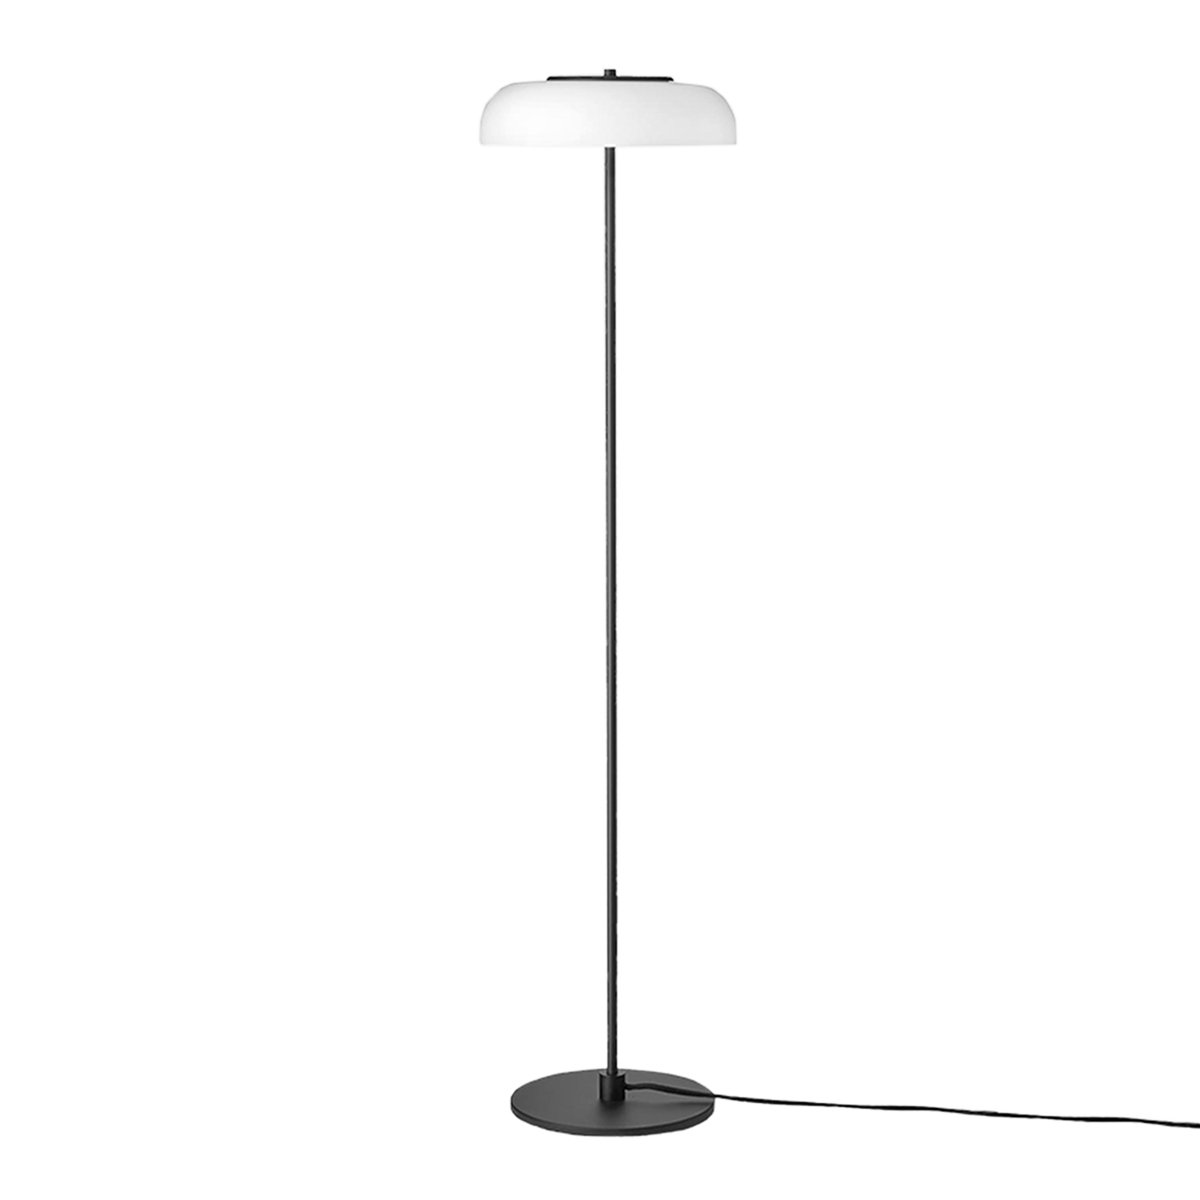 Nuura Blossi Vloerlamp �29 cm. - Black - Opal